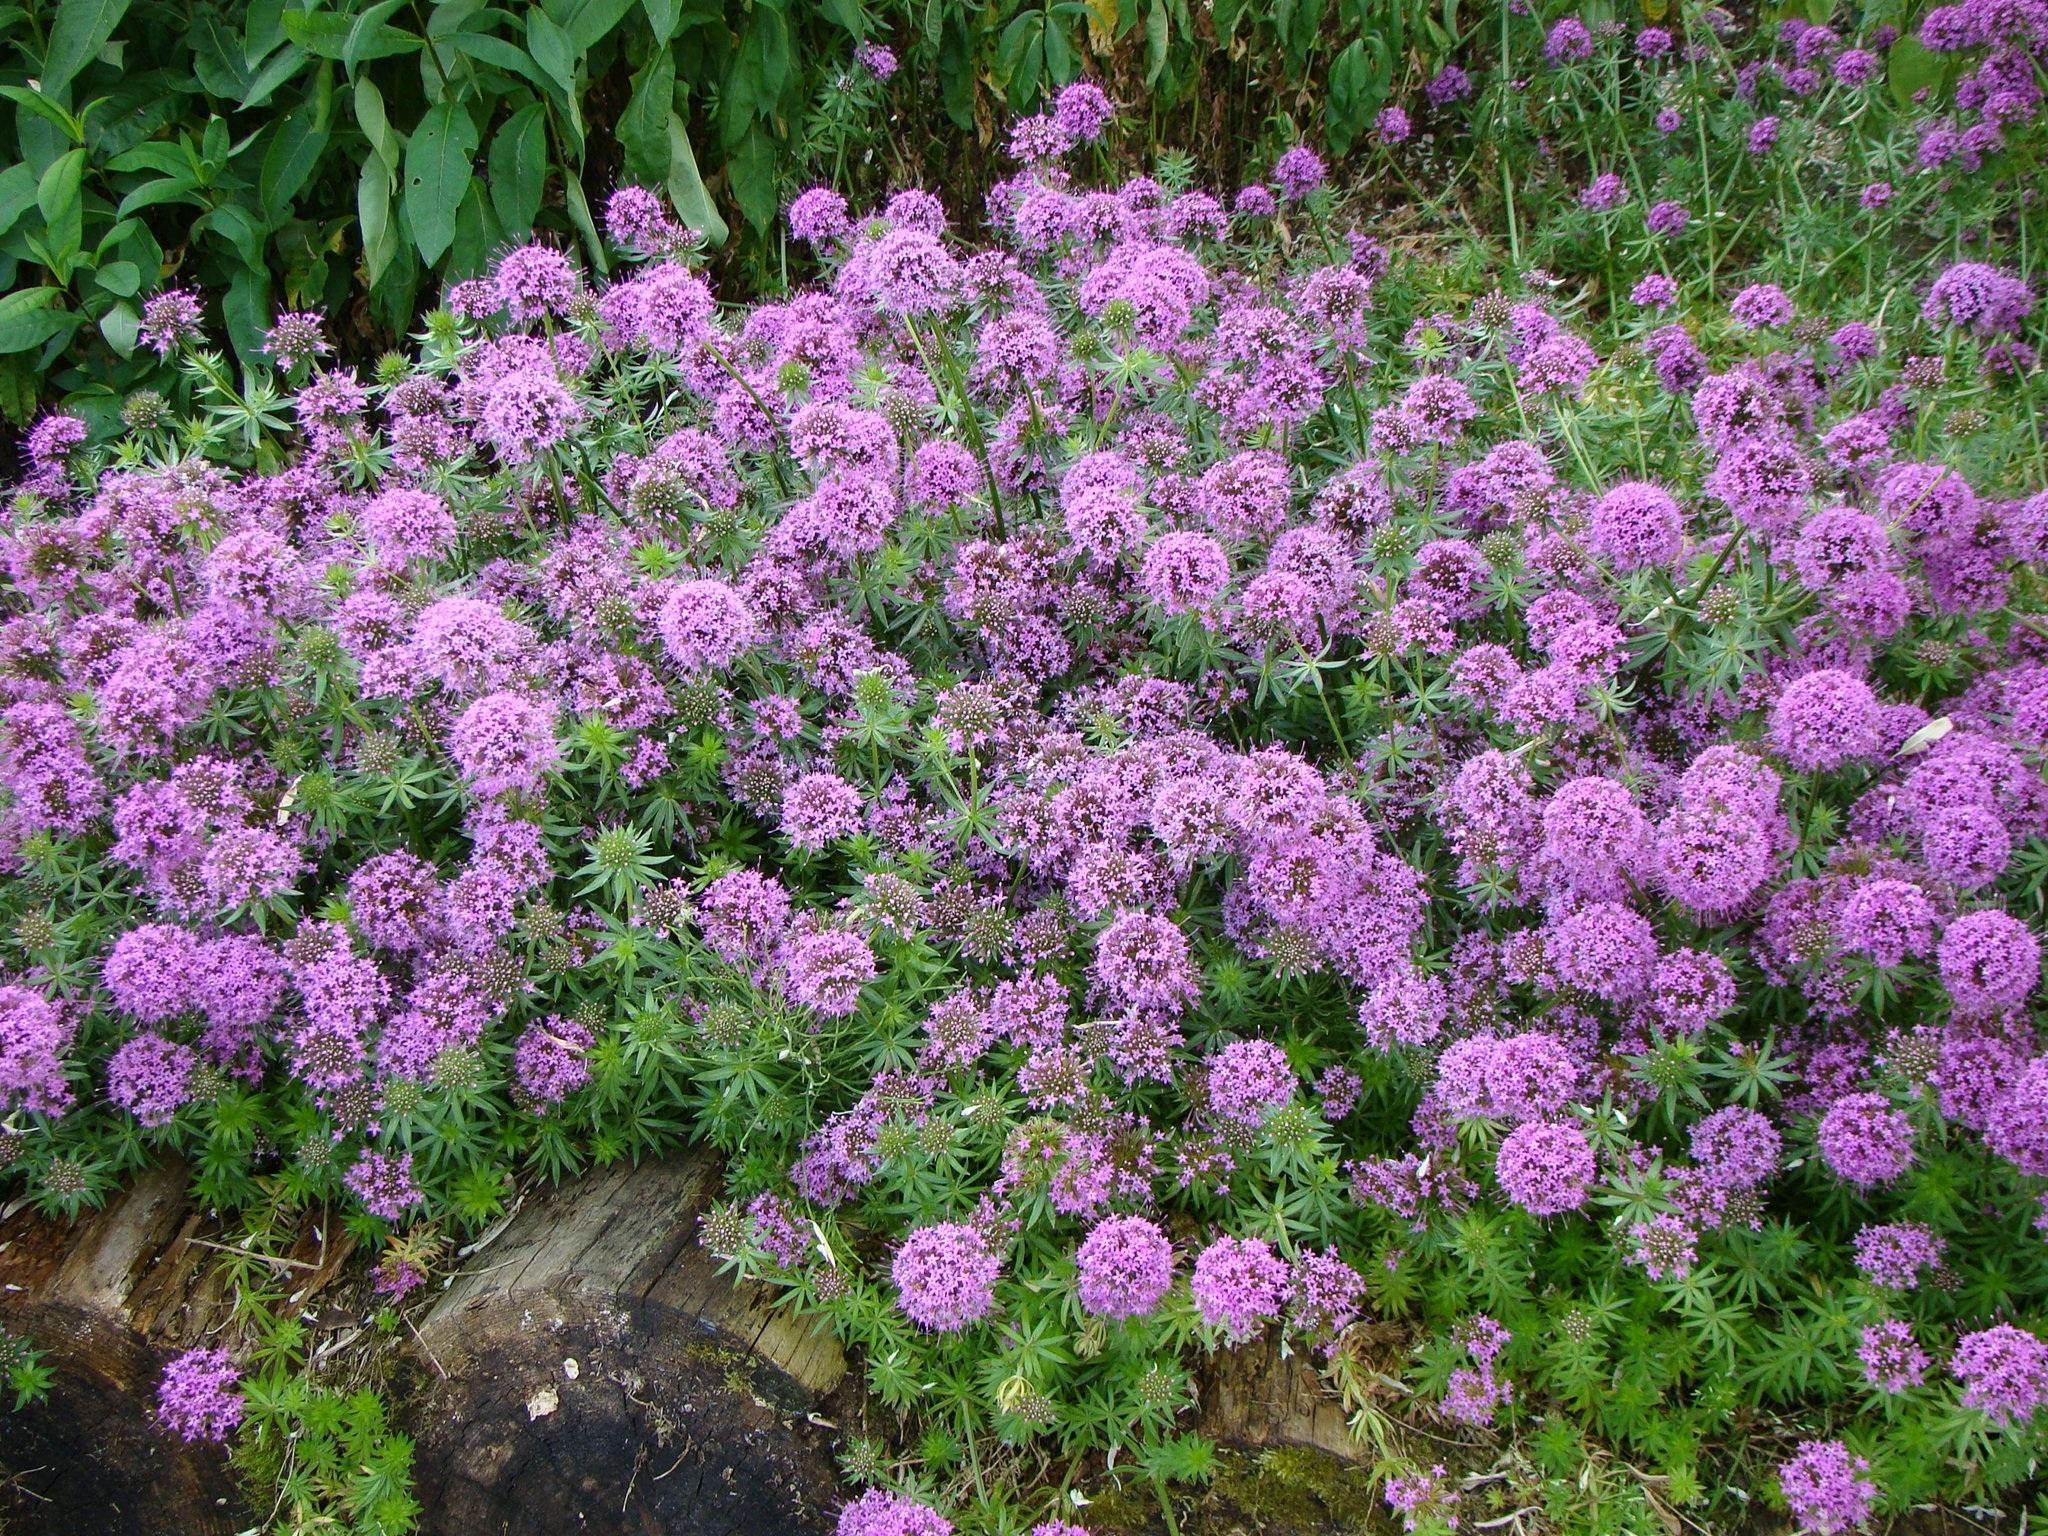 Plant Flower Herb Garden Pink Flora Shrub Groundcover Flowering Woody Land English Lavender